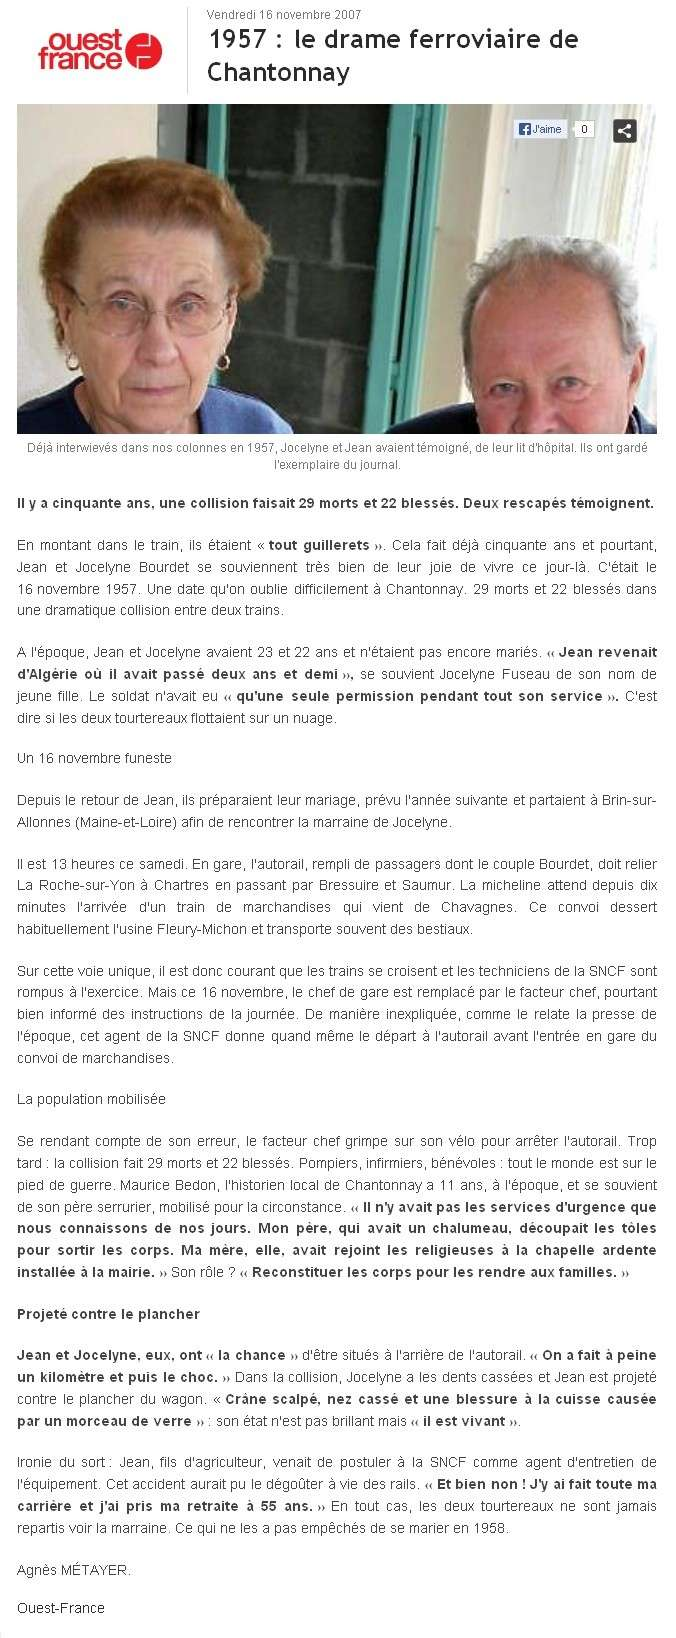 16 novembre 1957 - Catastrophe ferroviaire de Chantonnay 2007-o10